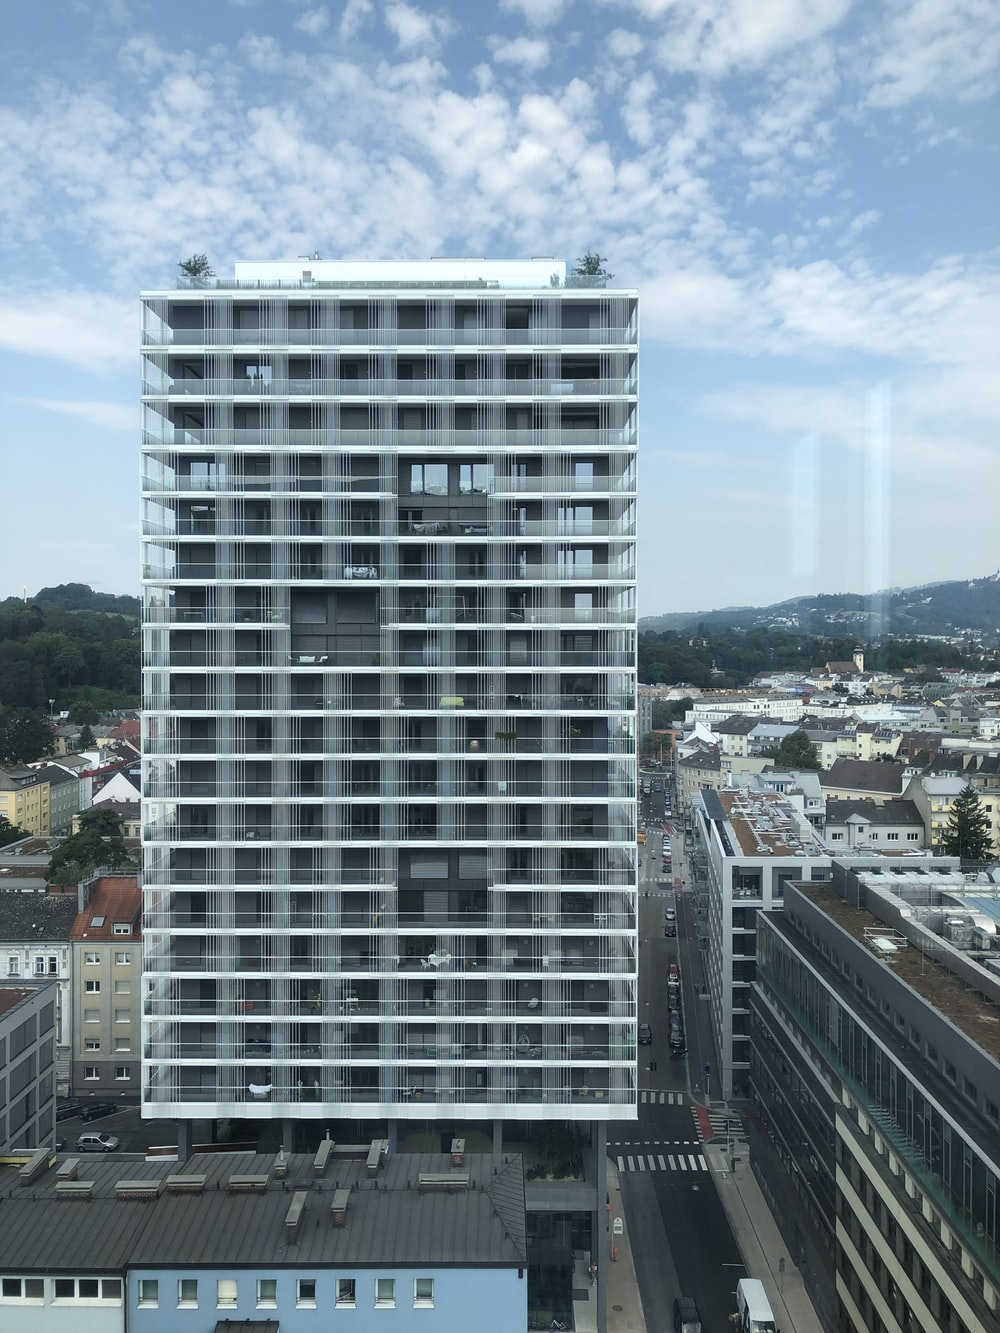 high-rise building near city under boue sky